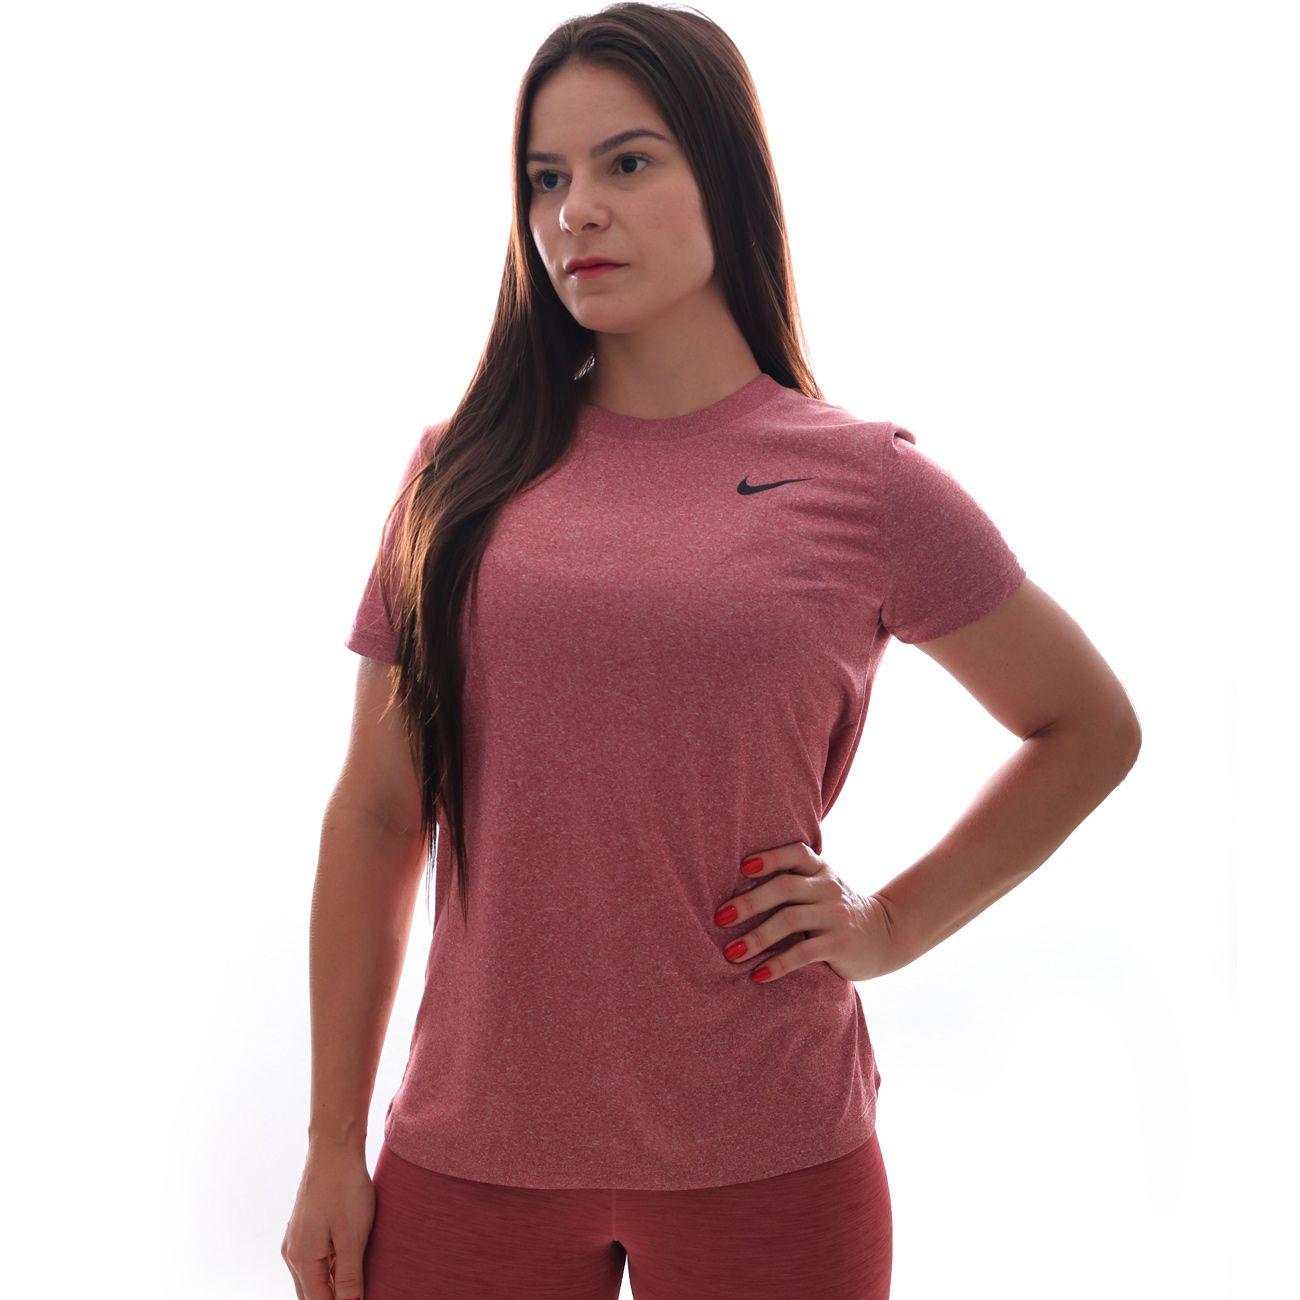 Camiseta Nike Tee Crew Feminina